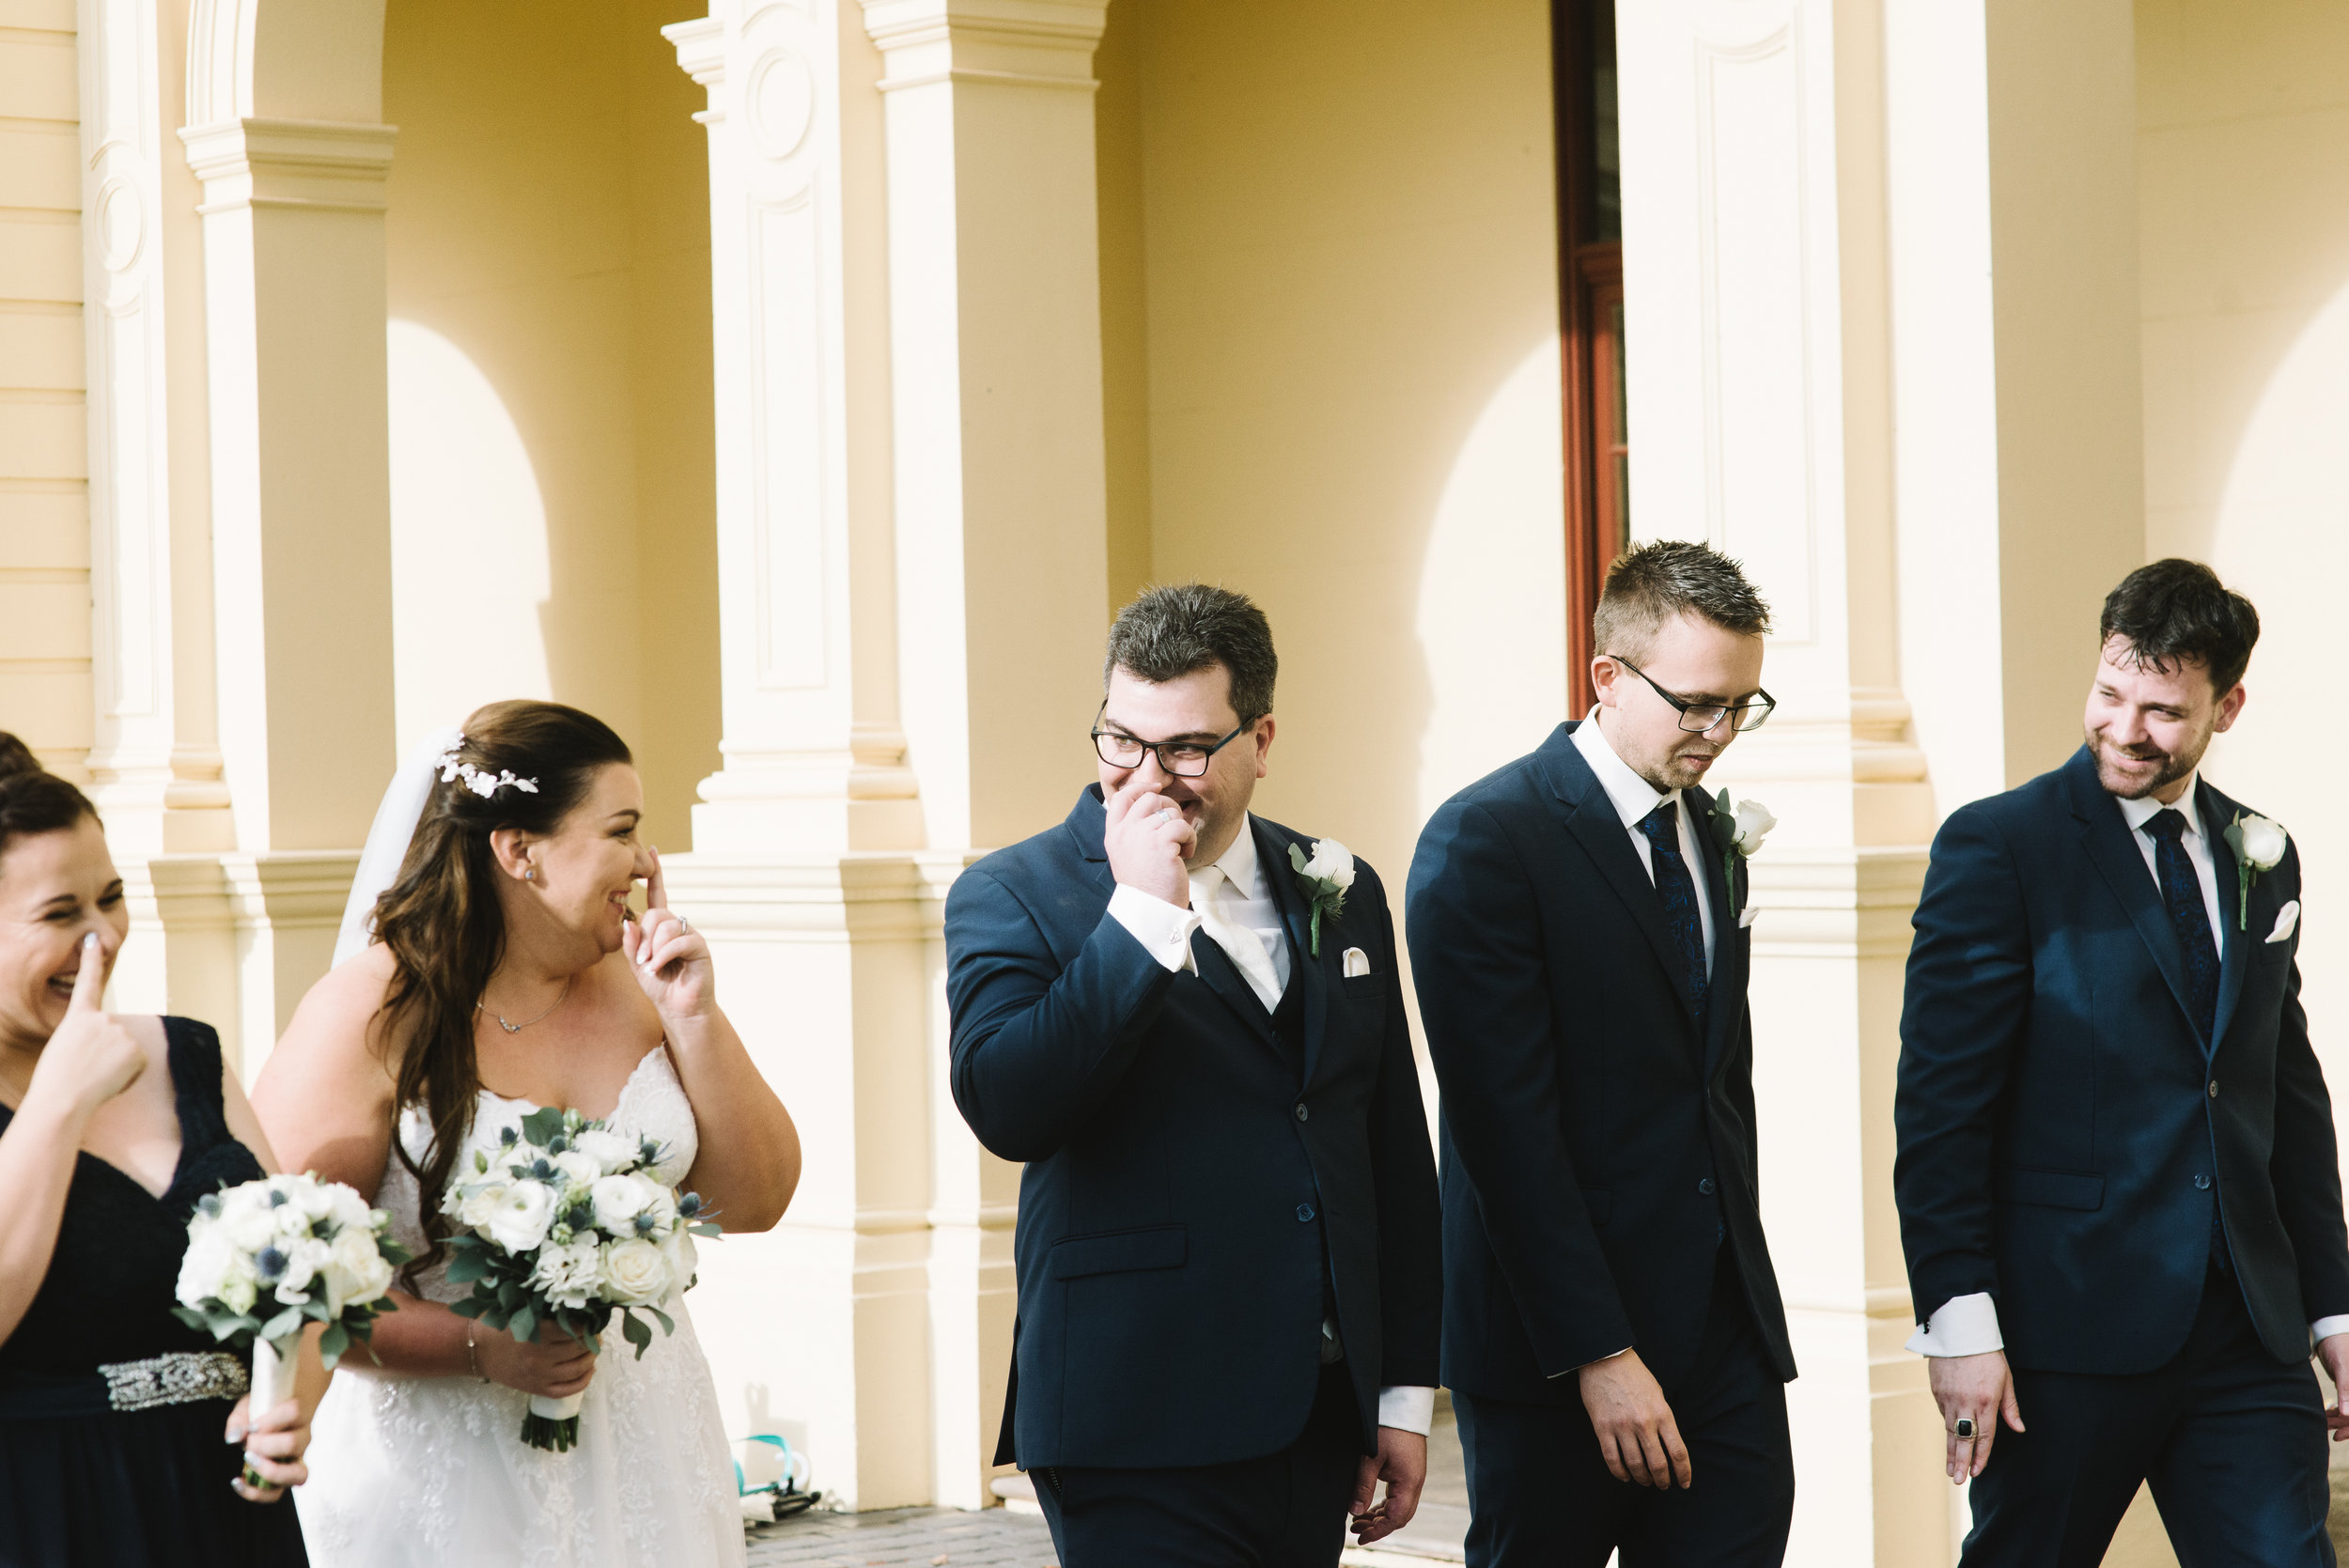 brisbane-wedding-photographer-68.jpg